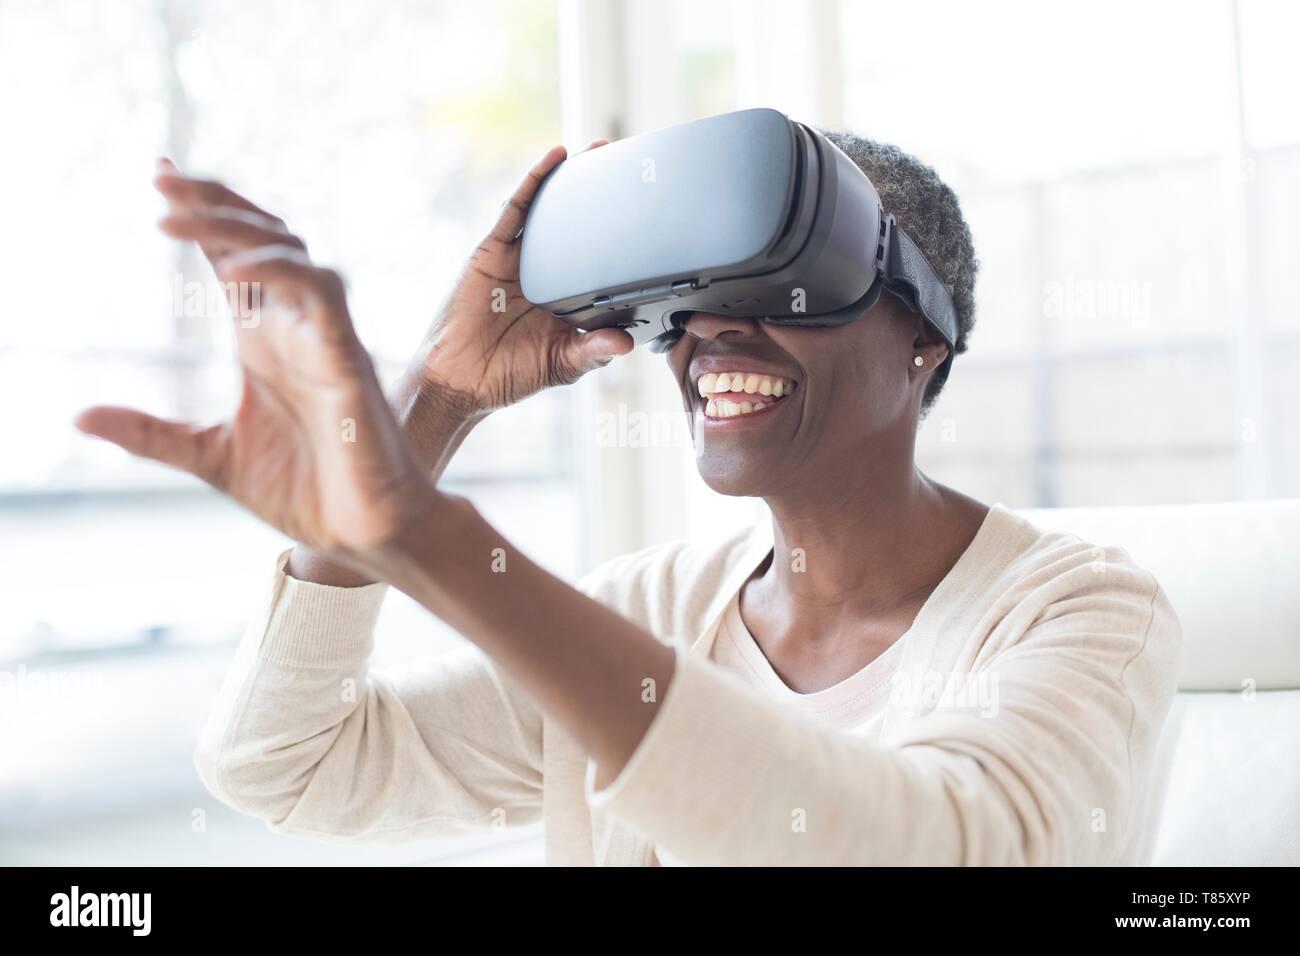 Woman wearing VR headset - Stock Image